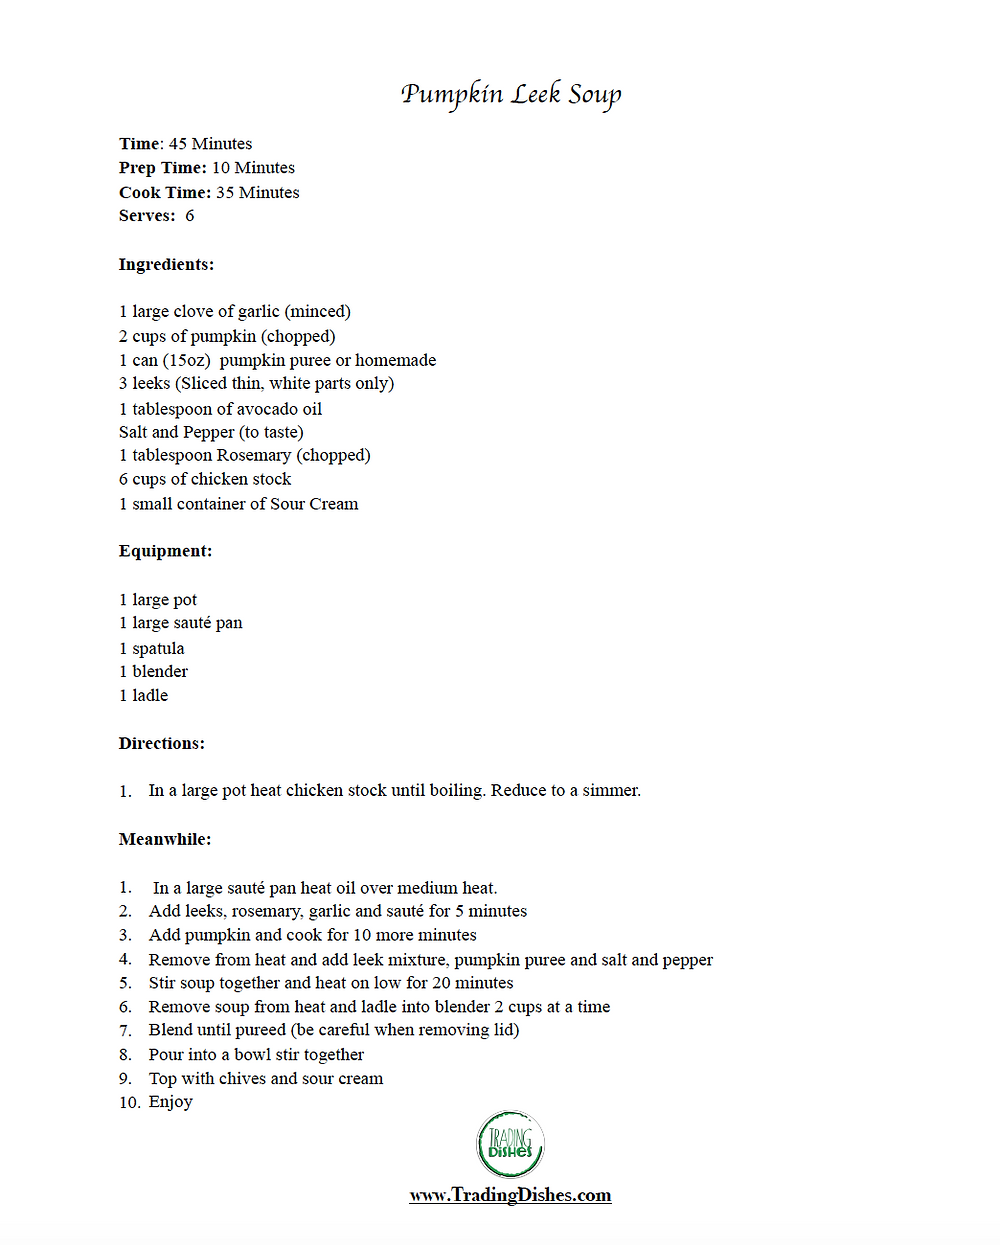 Pumpkin Leek Soup Recipe